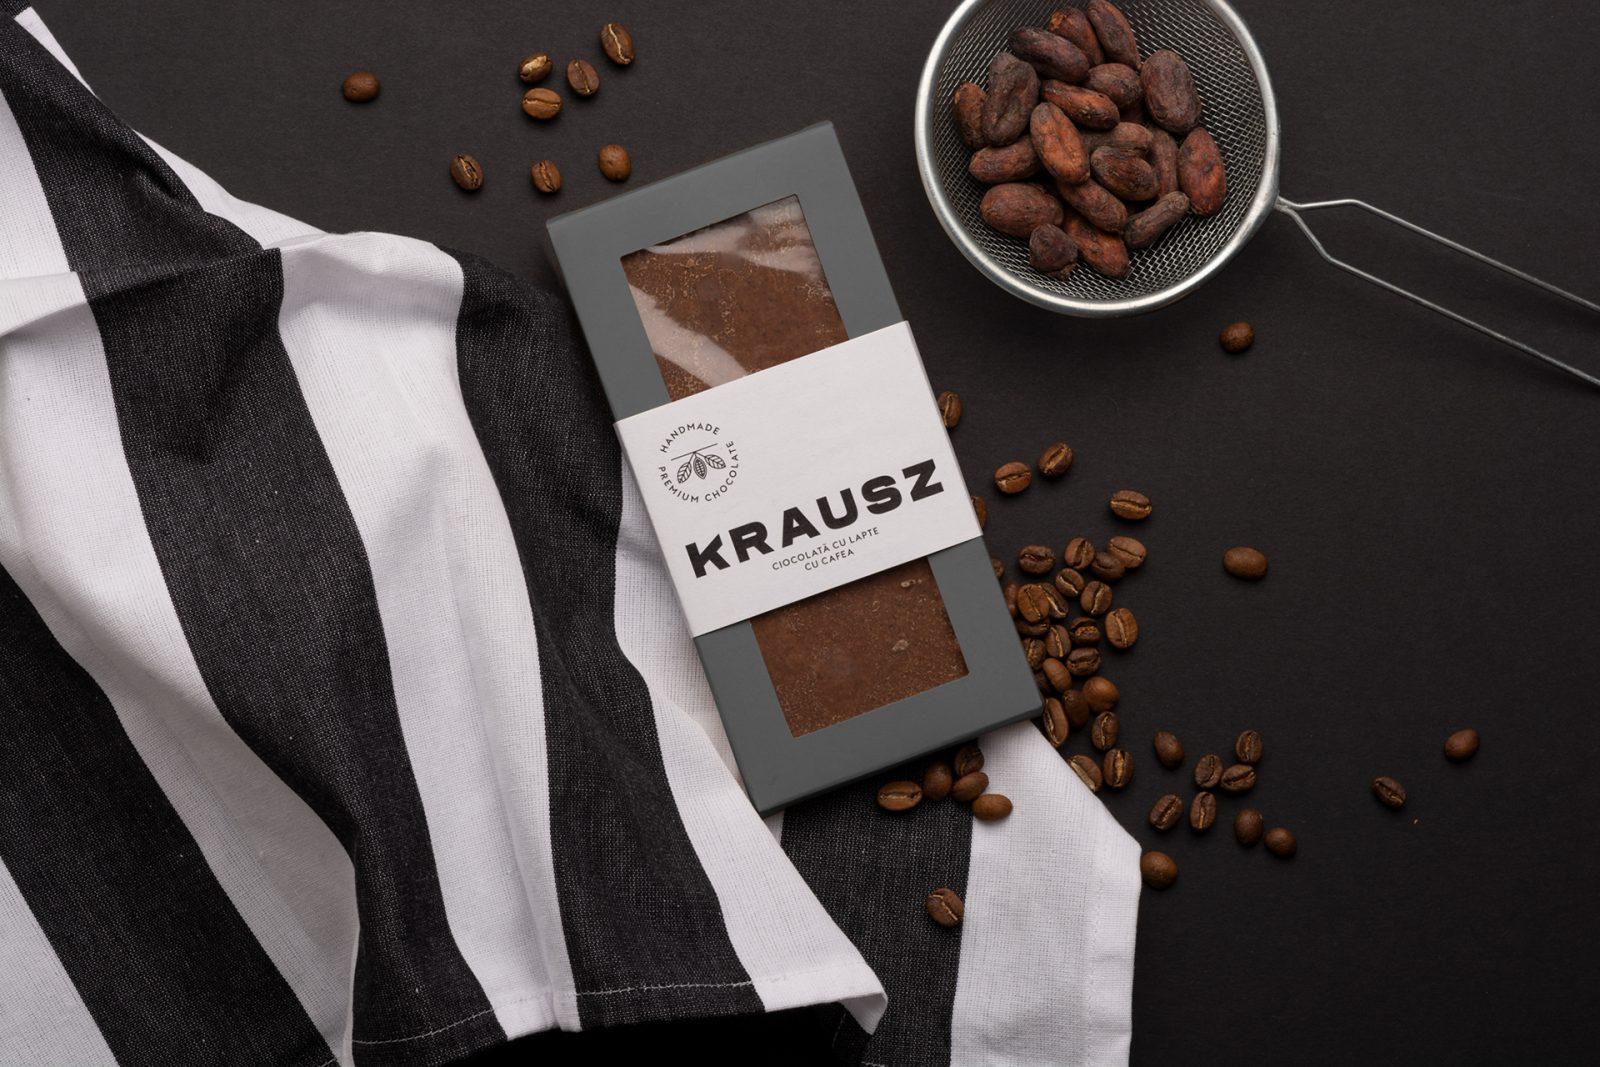 Chocolate Confectionery Krausz Packaging & Branding by Peltan-Brosz Studio